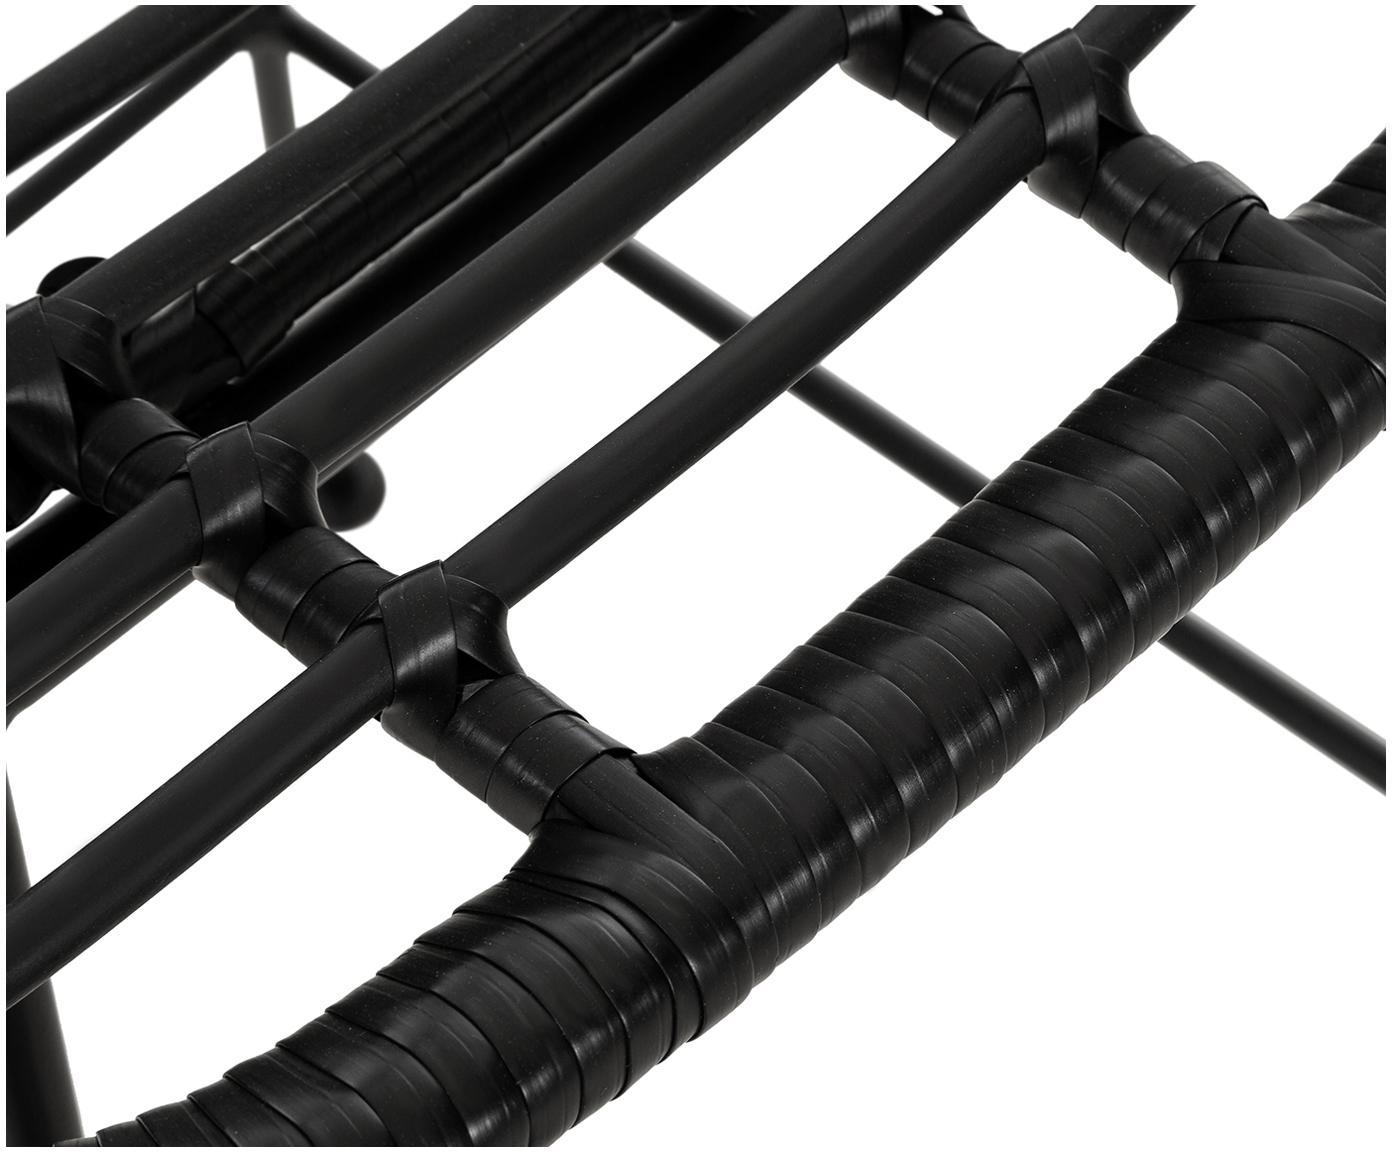 Polyrattan-Barstuhl Costa, Sitzfläche: Polyethylen-Geflecht, Gestell: Metall, pulverbeschichtet, Schwarz, 56 x 98 cm